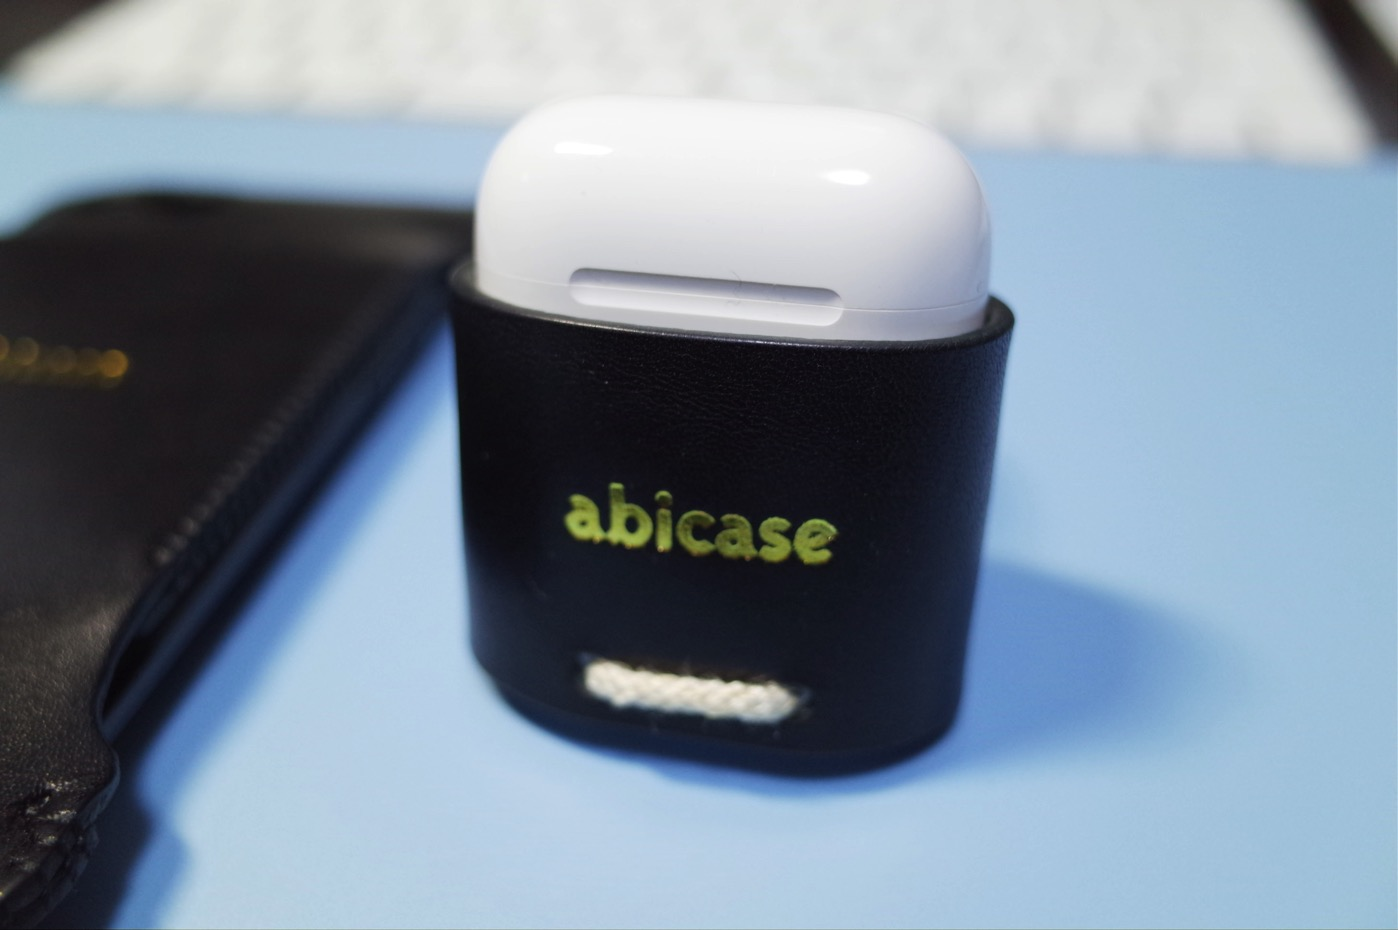 iPhone 7 ジェットブラック & abicase-3